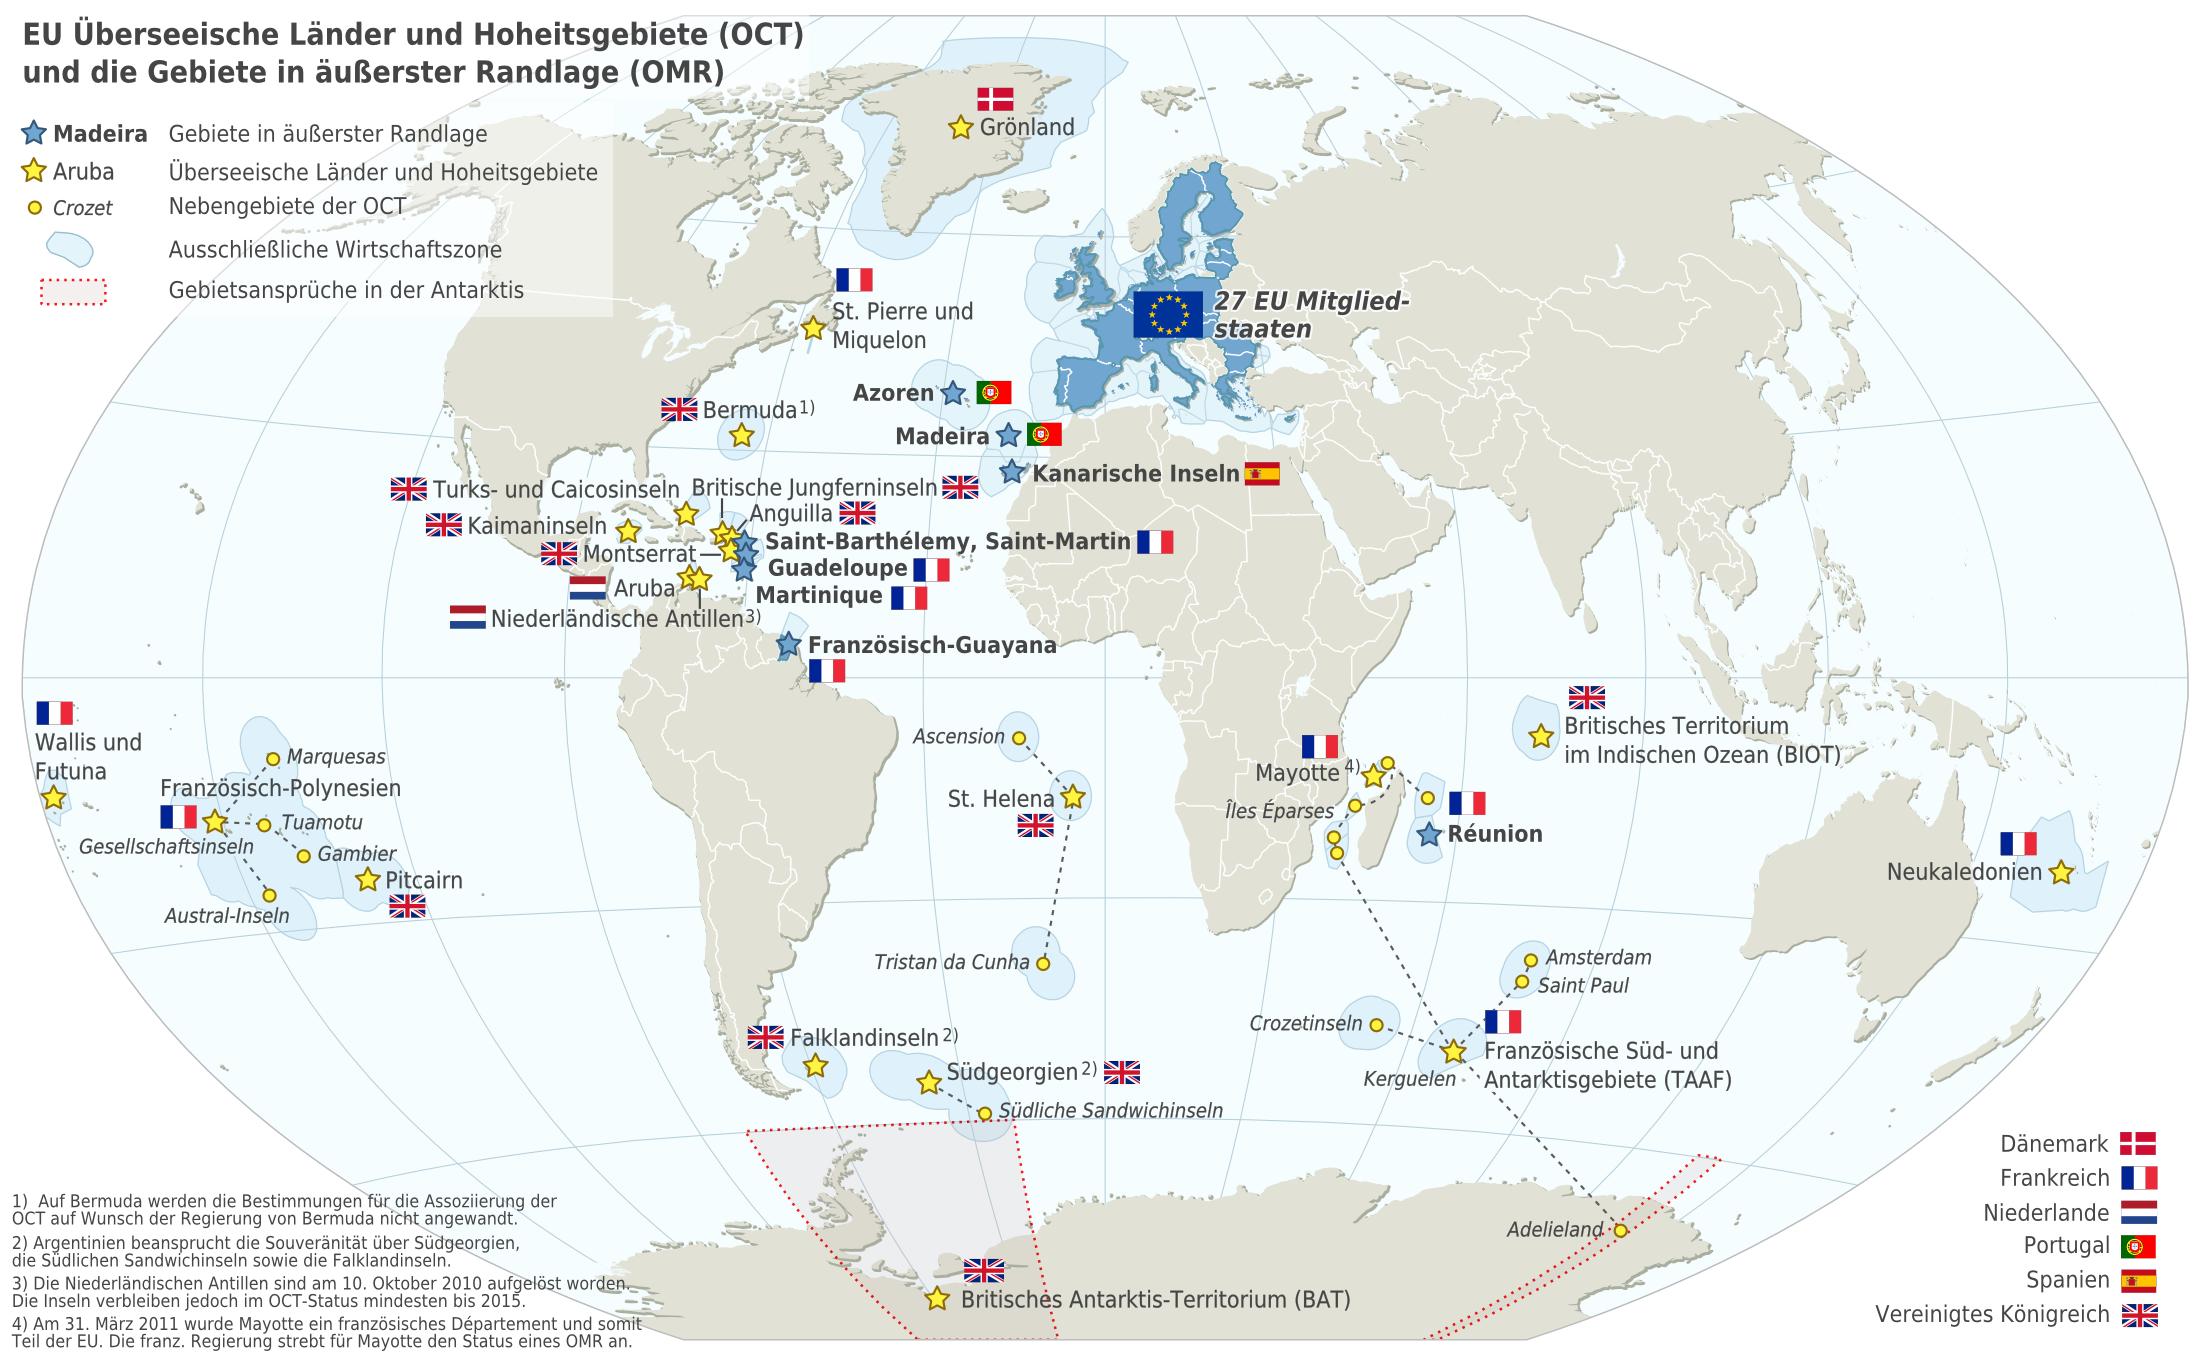 Karte Eu.Karte Europäische Union Karte überseegebiete Der Eu Weltkarte